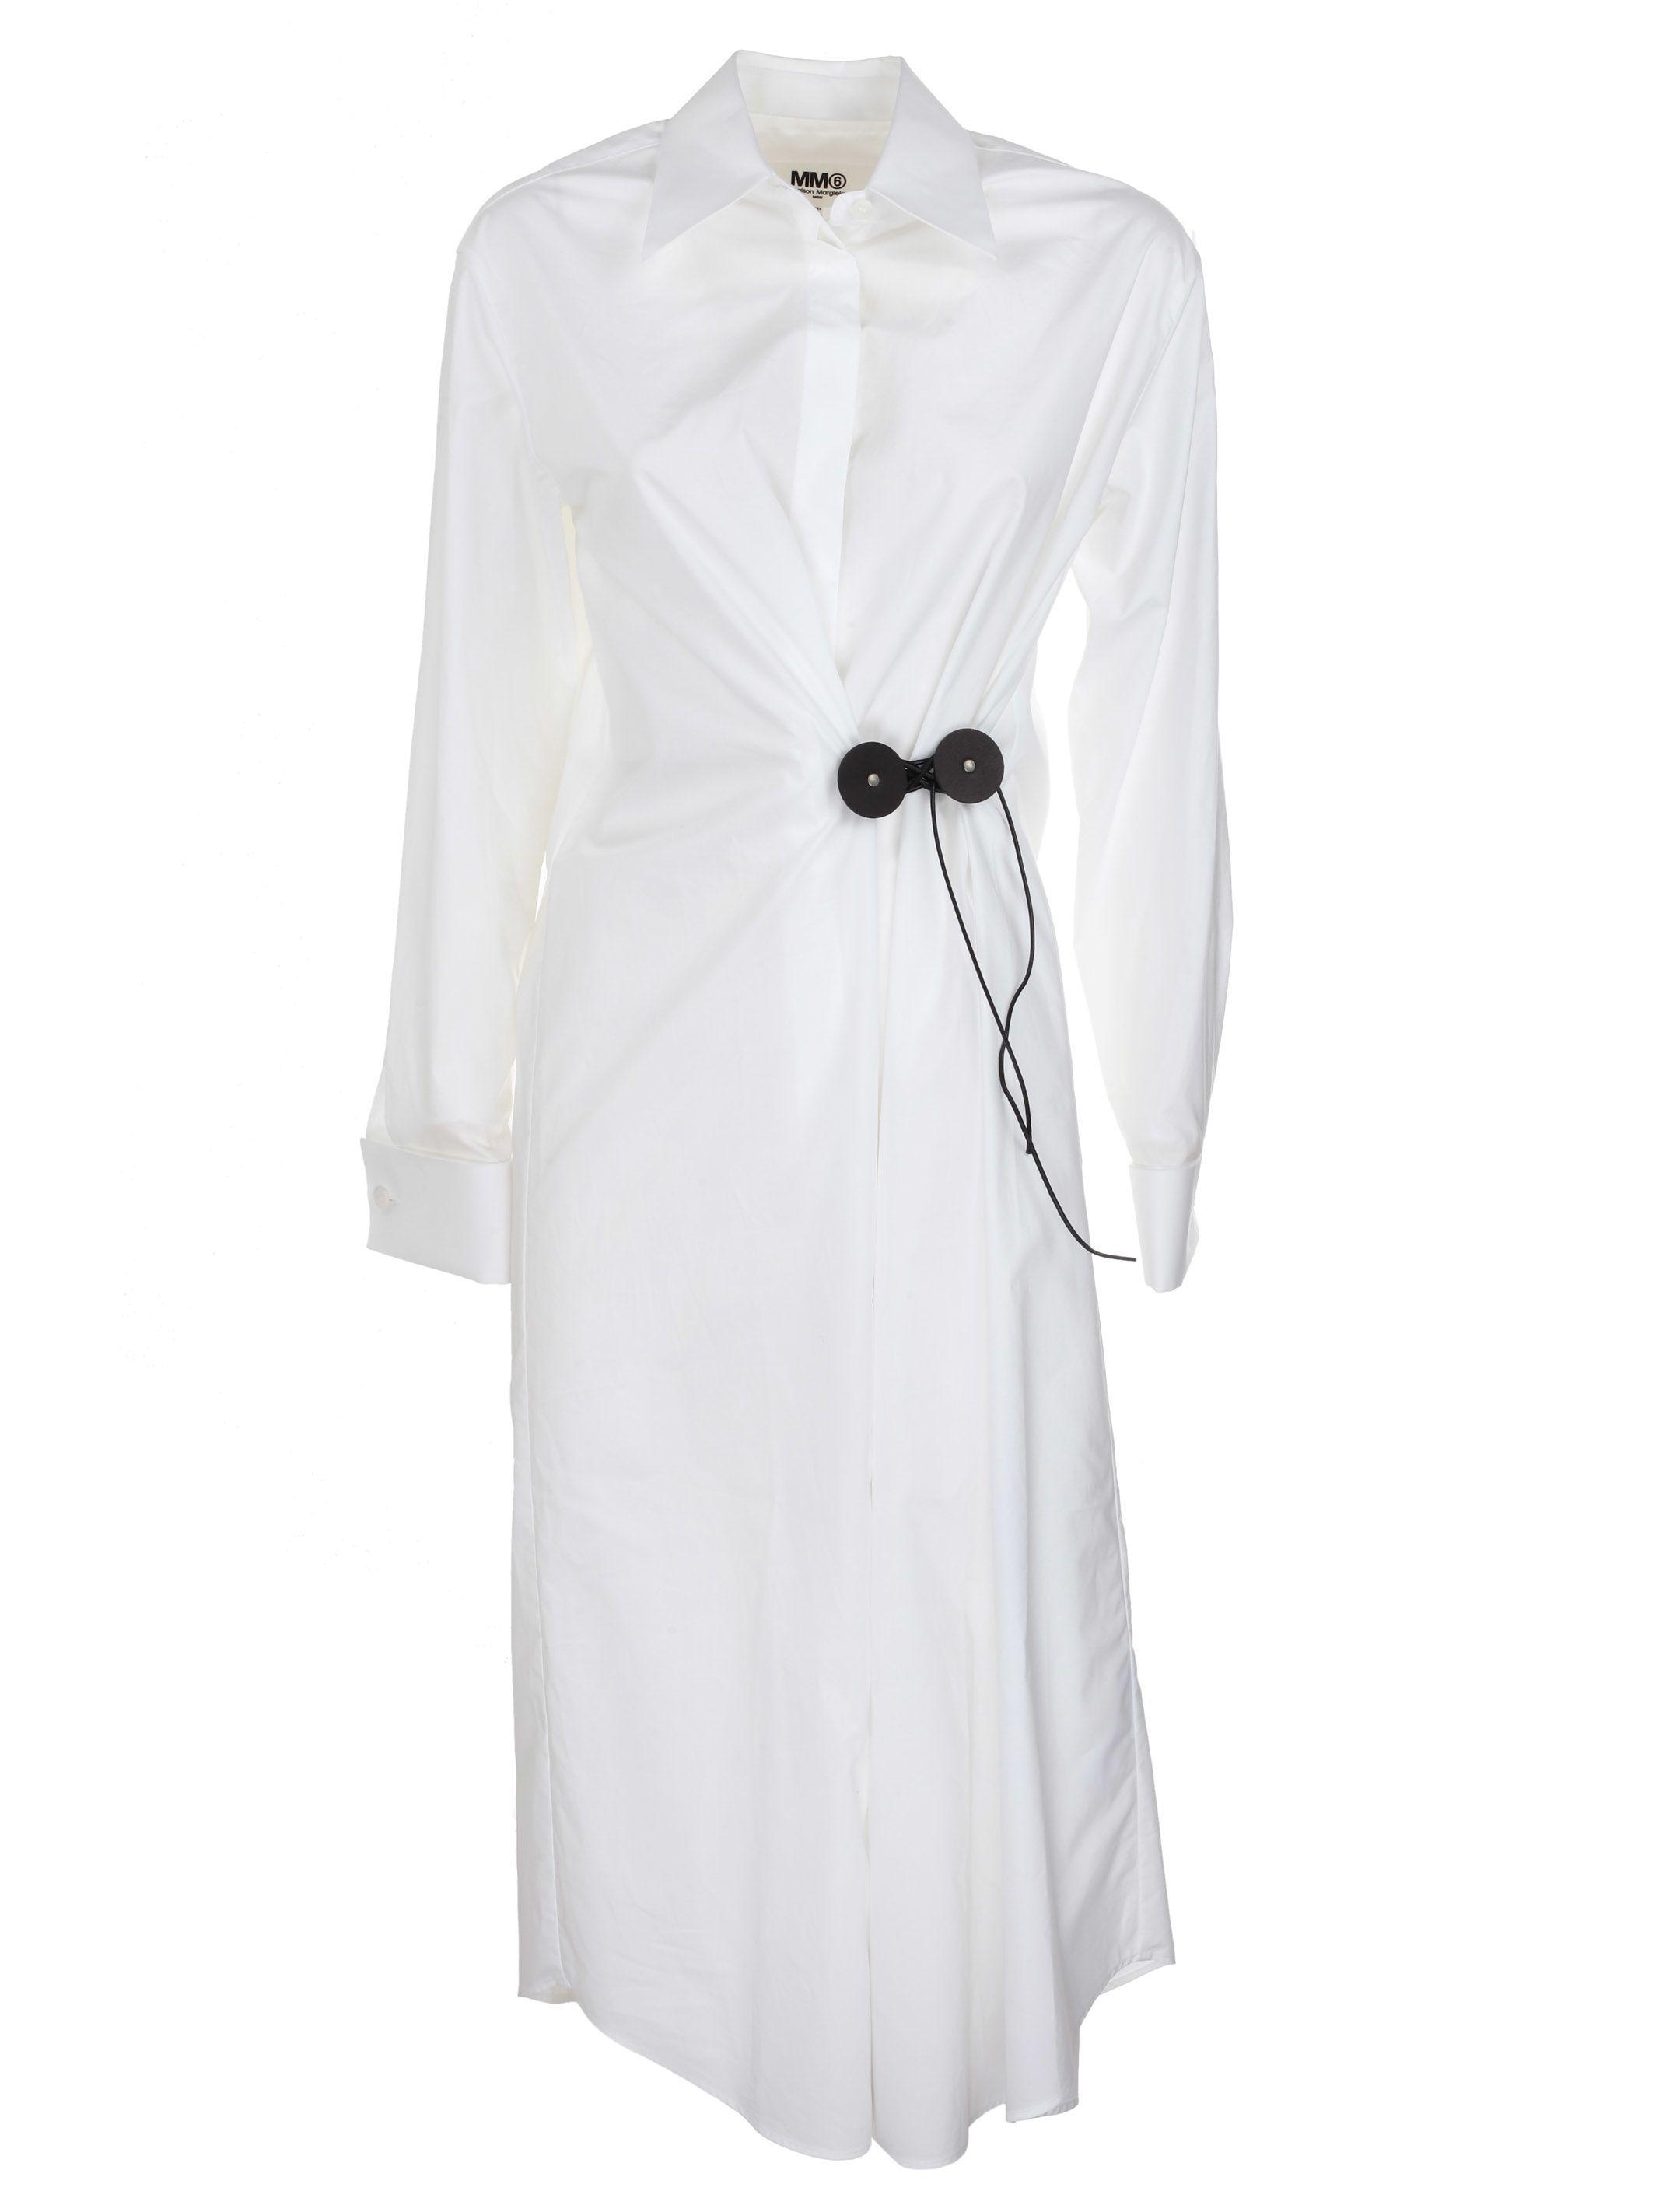 MM6 Maison Margiela Maison Margiela Wrap Shirt Dress